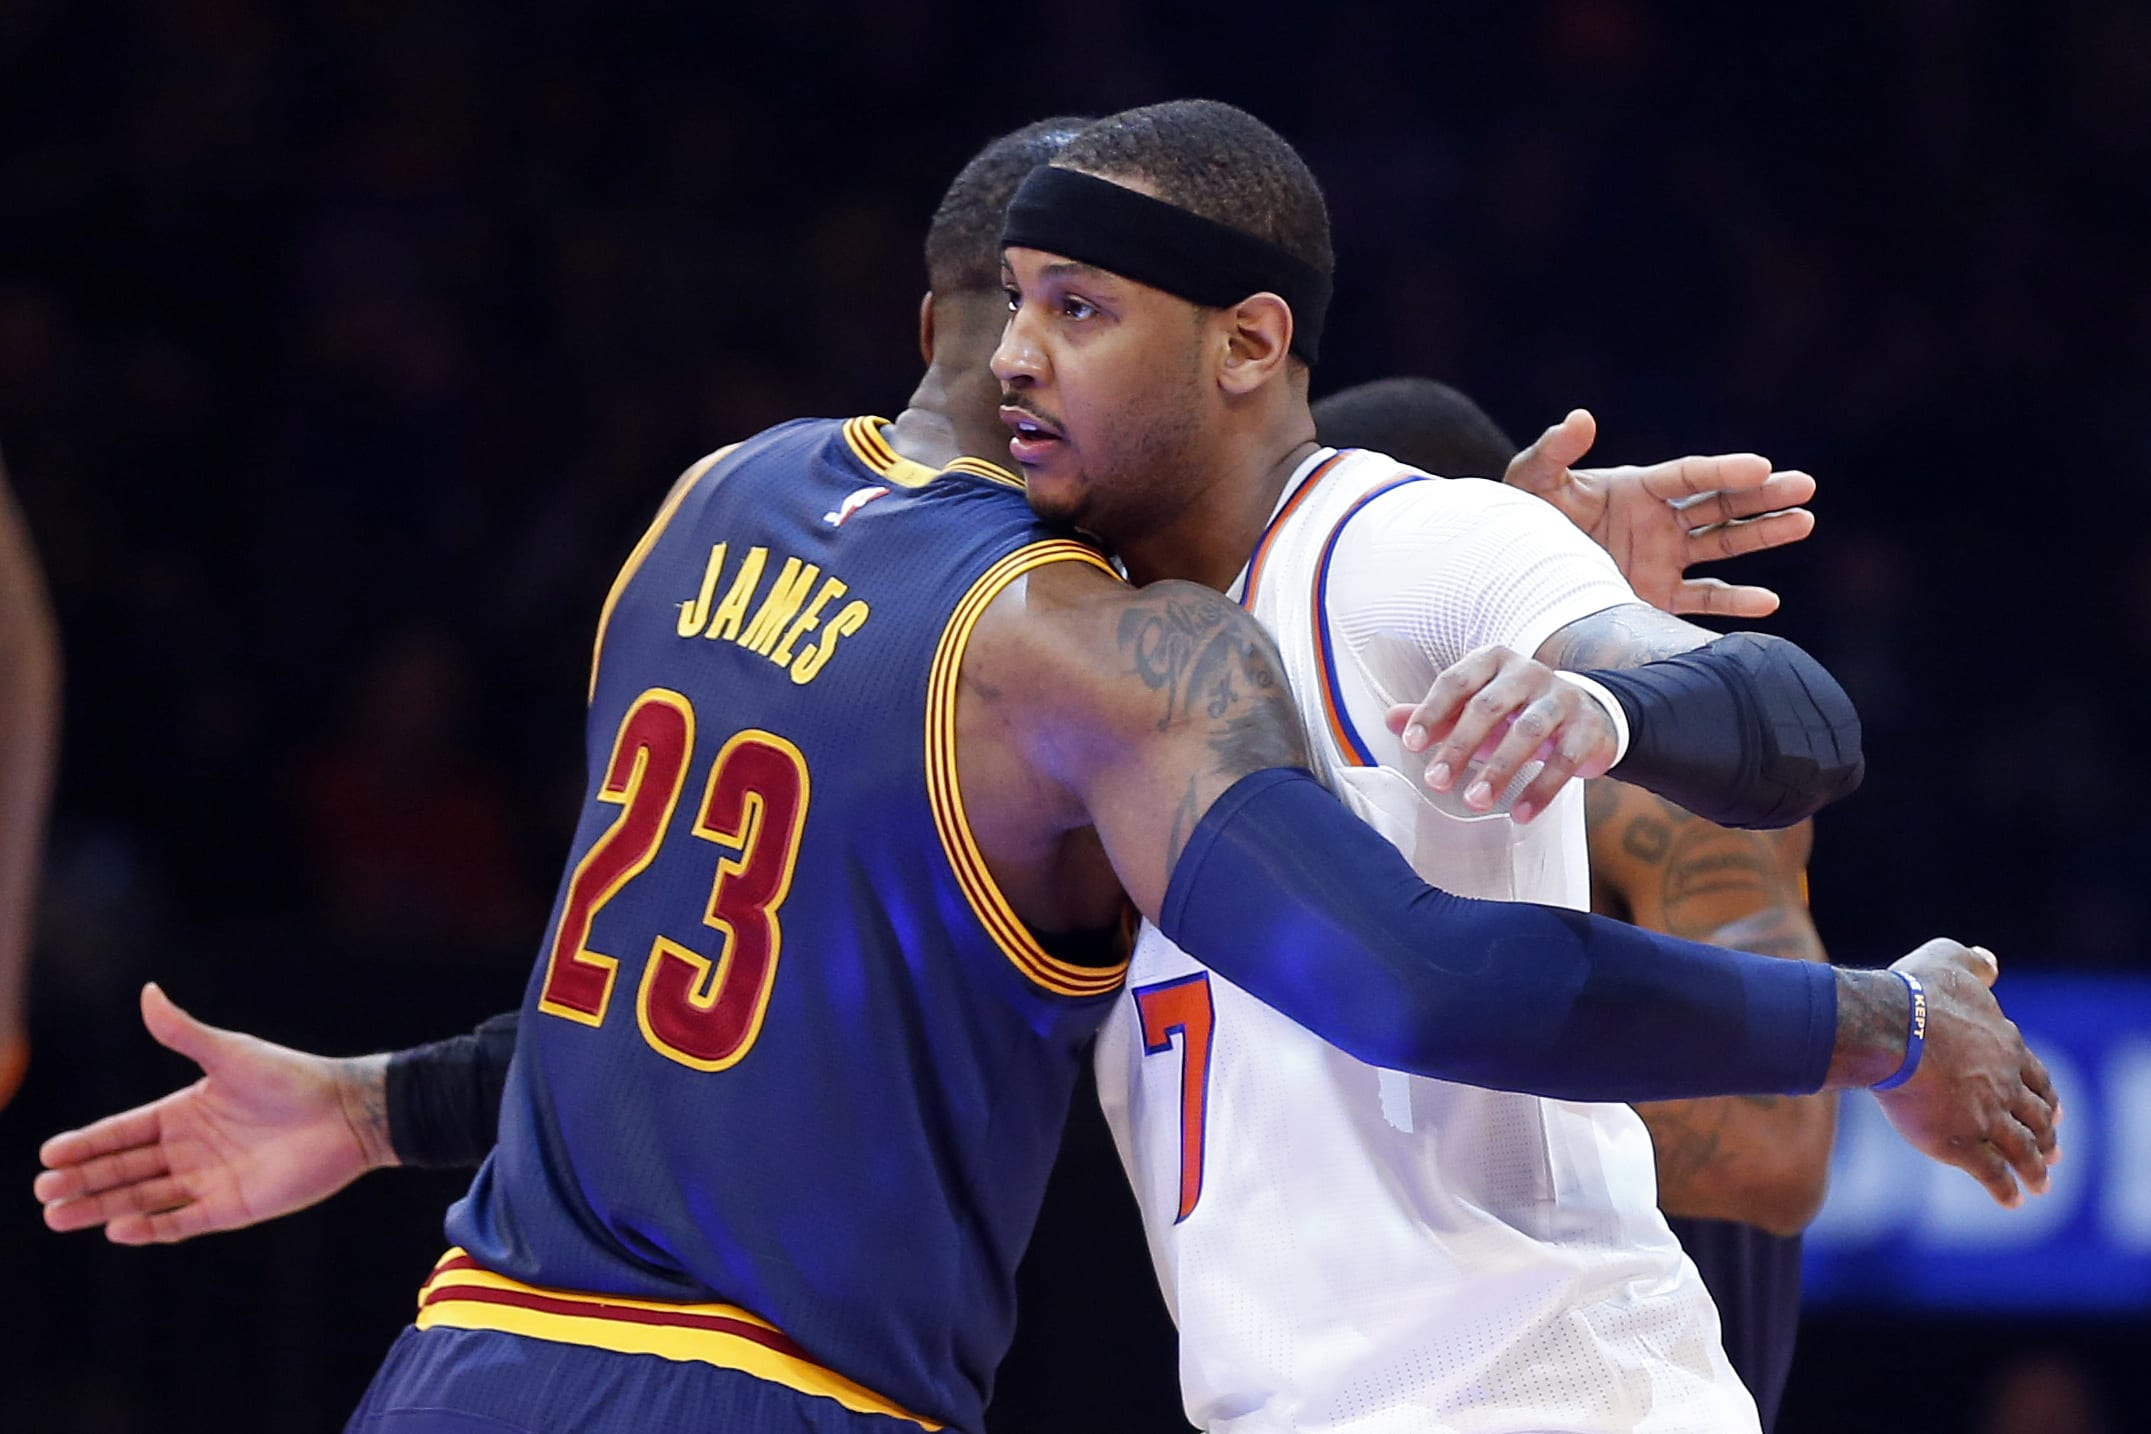 Carmelo Anthony LeBron James Knicks Cavs Hug MSG 2017